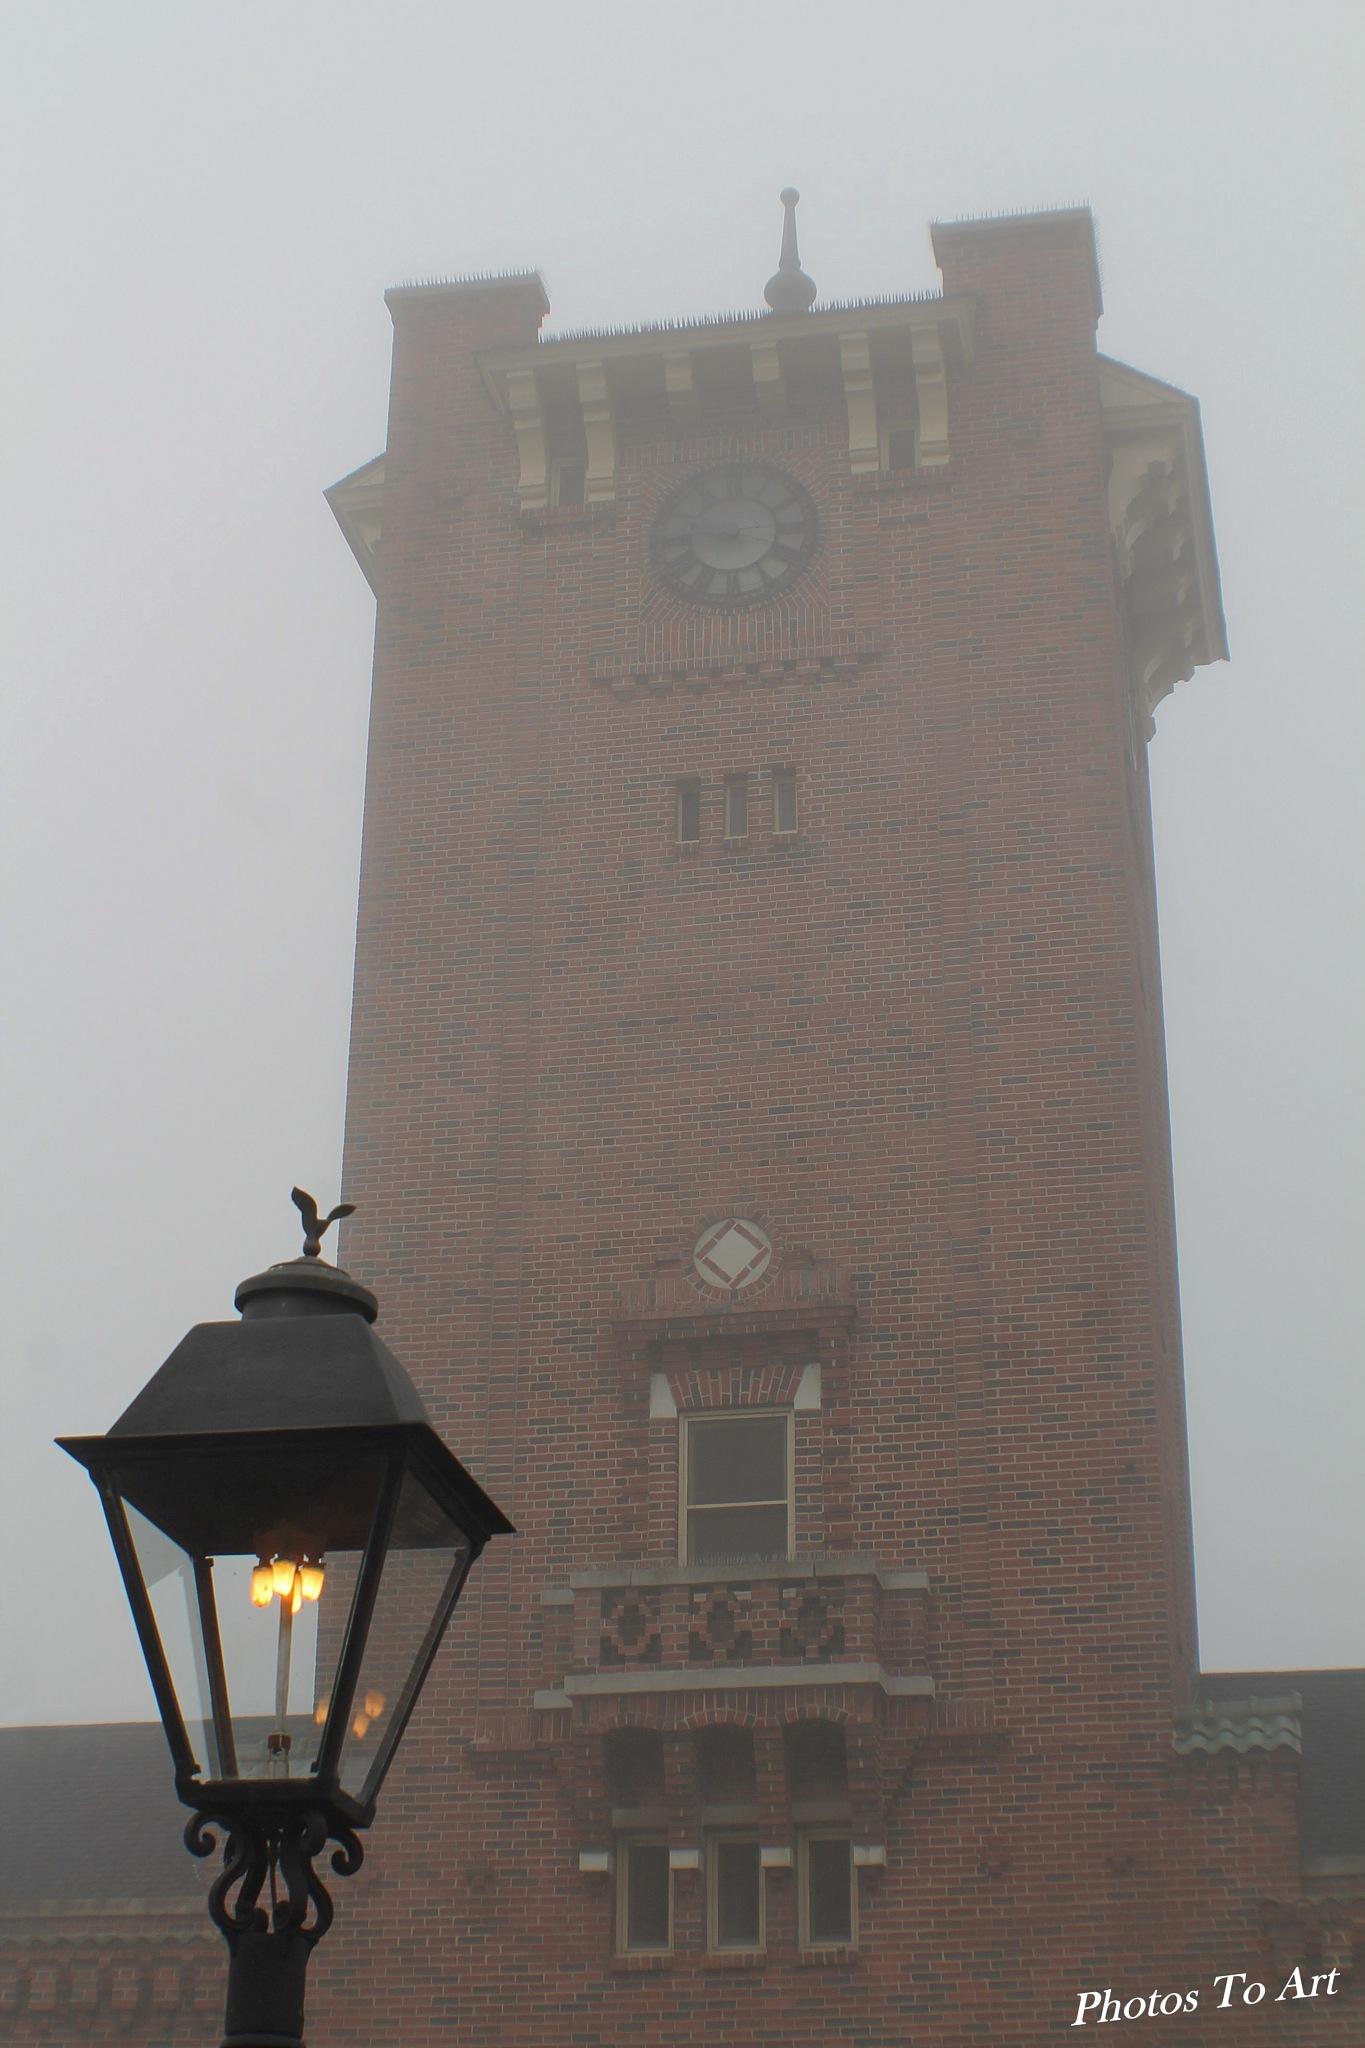 a light in the fog by Calvin Burdette